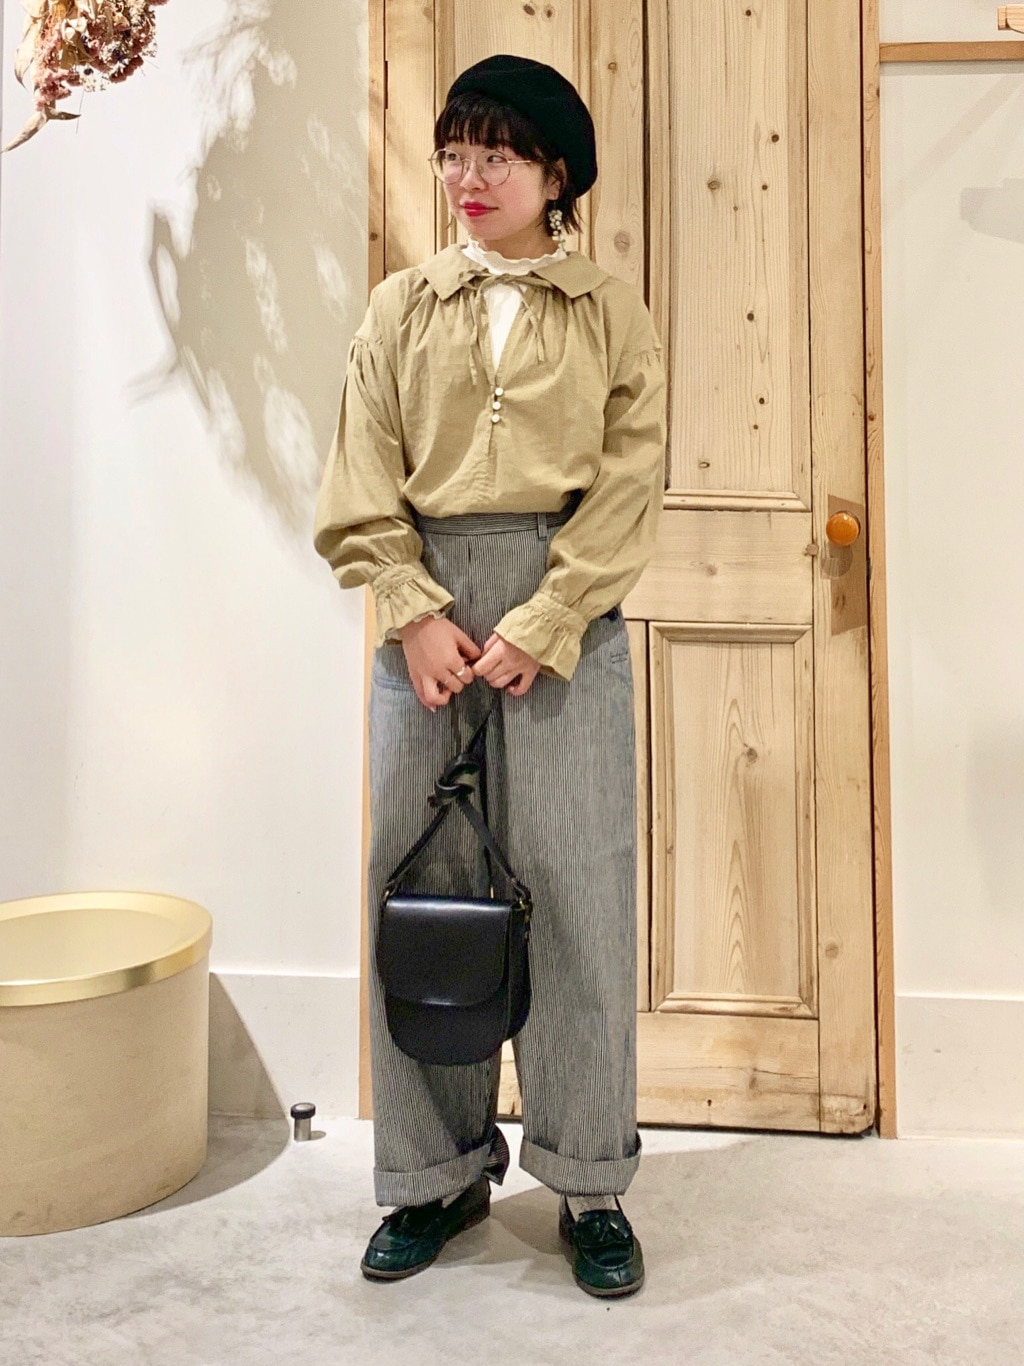 Malle chambre de charme 調布パルコ 身長:153cm 2020.12.30